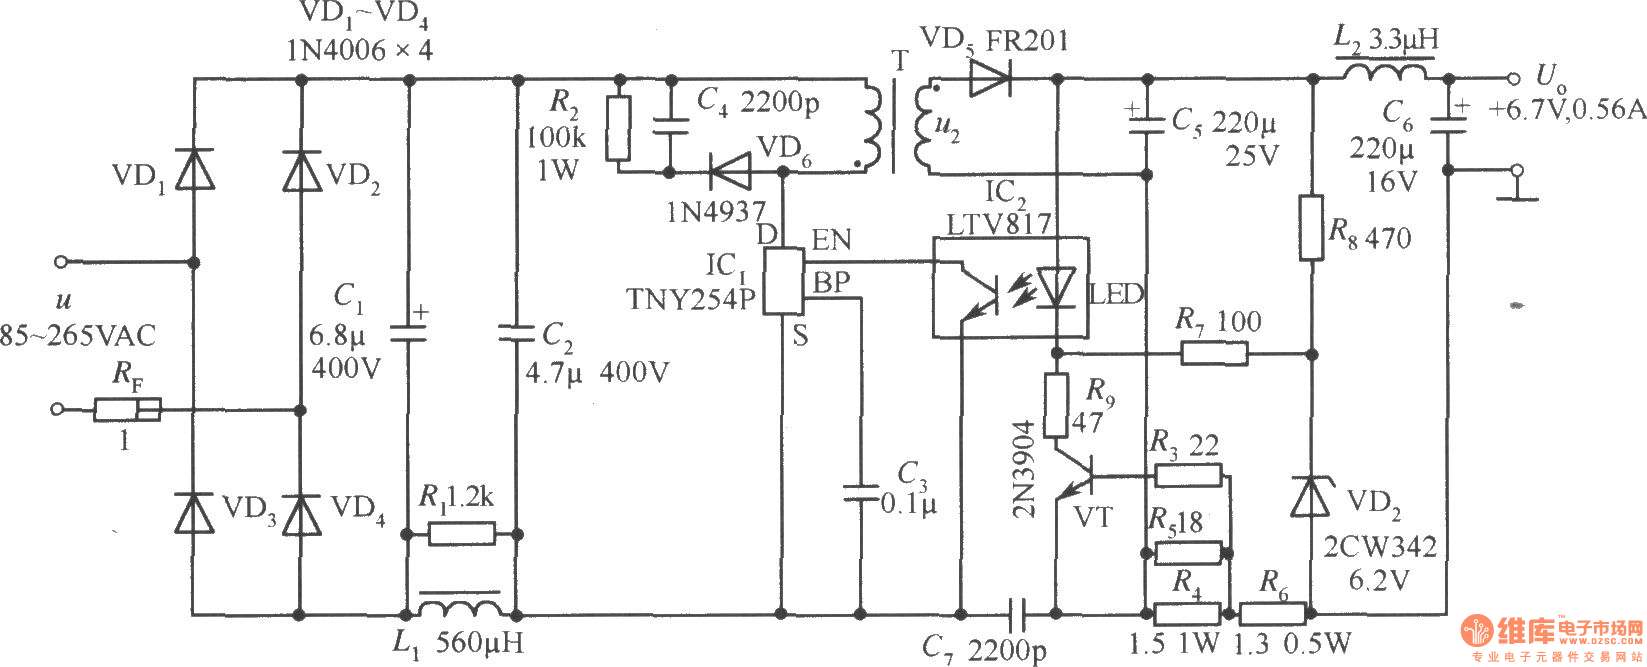 TNY254P构成的+6.7V、0.56A手机电池恒流充电器电路